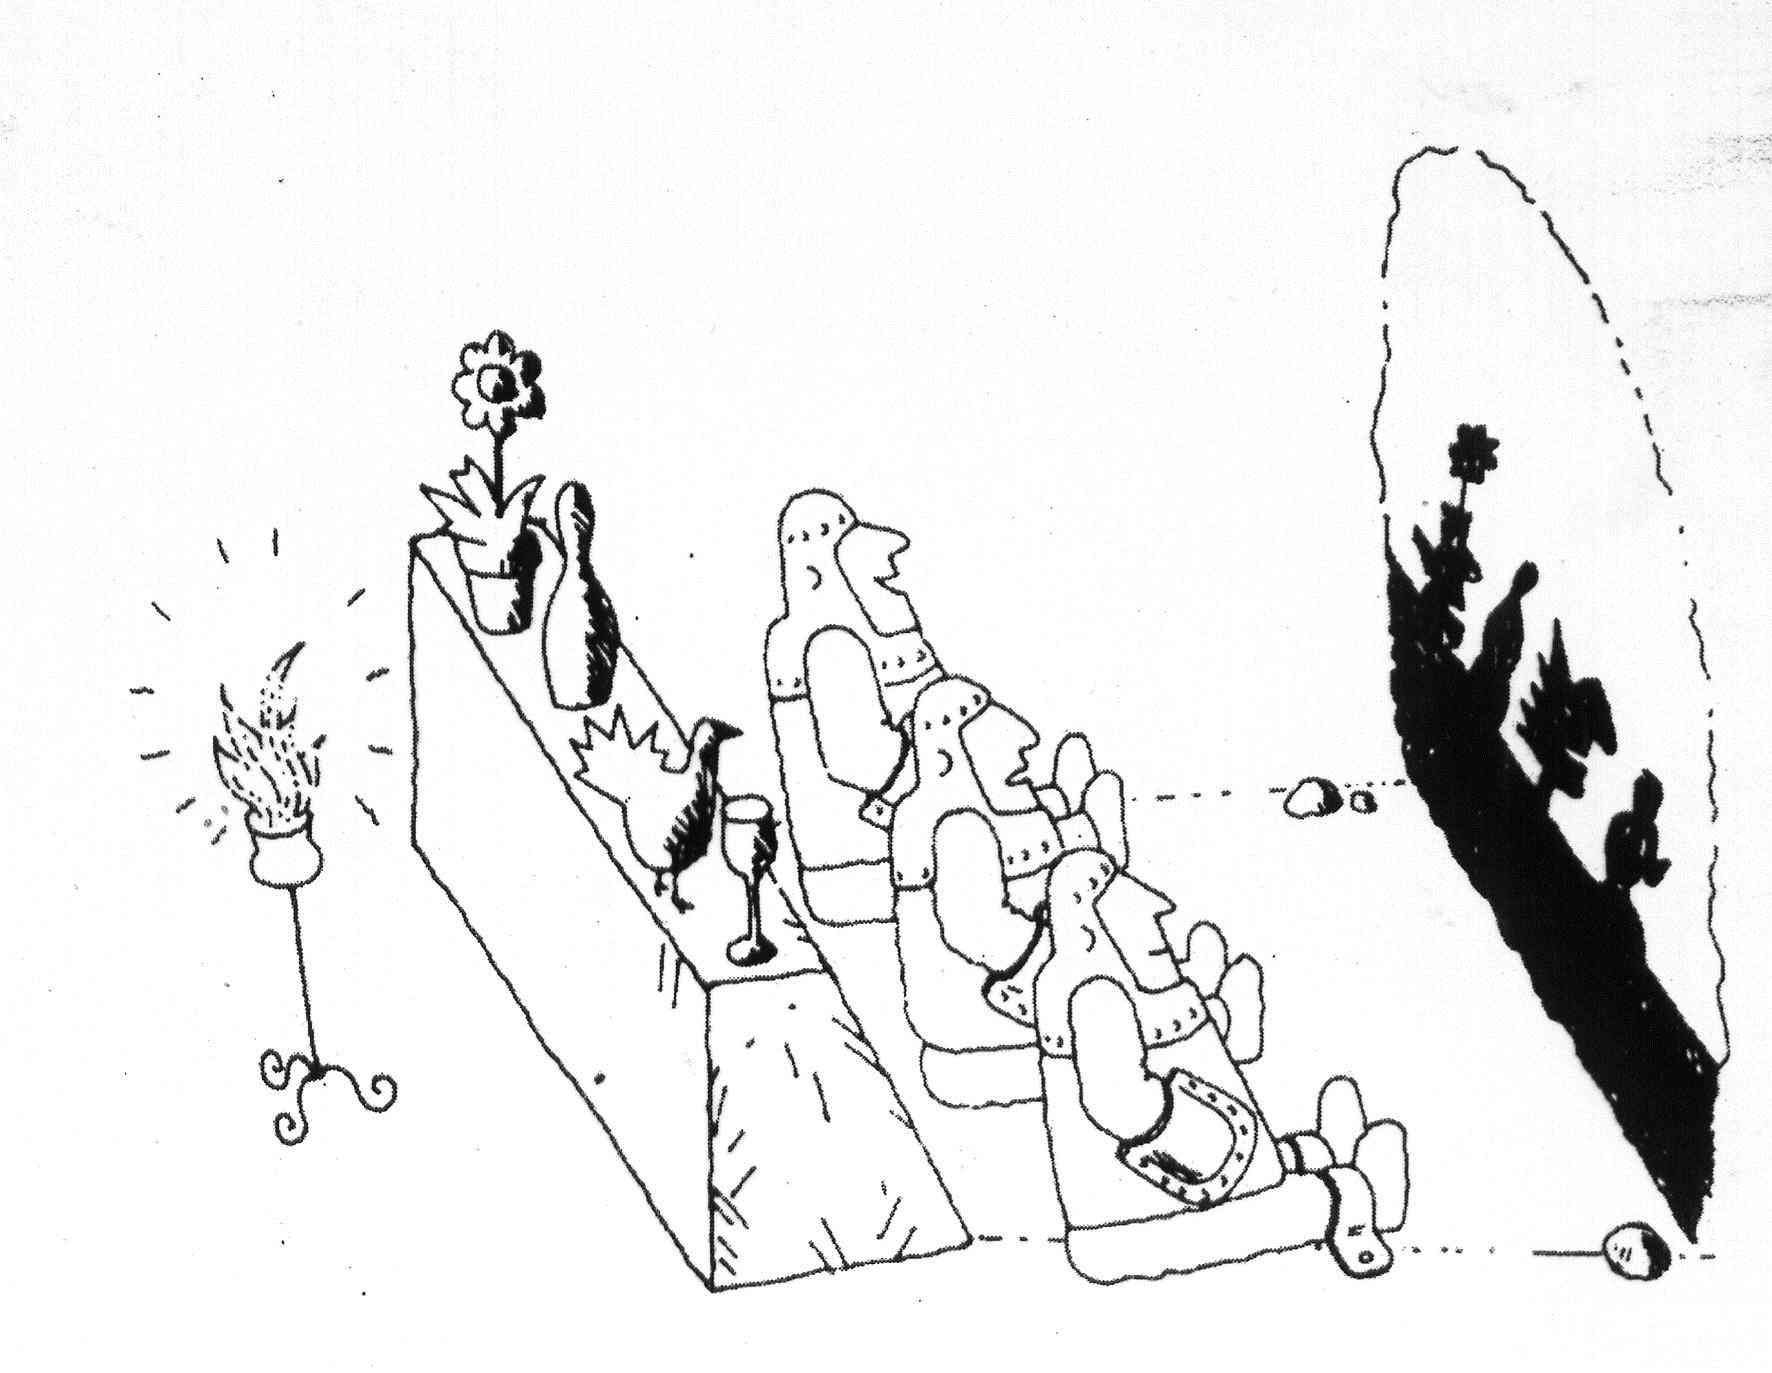 Platos Cave and Depression